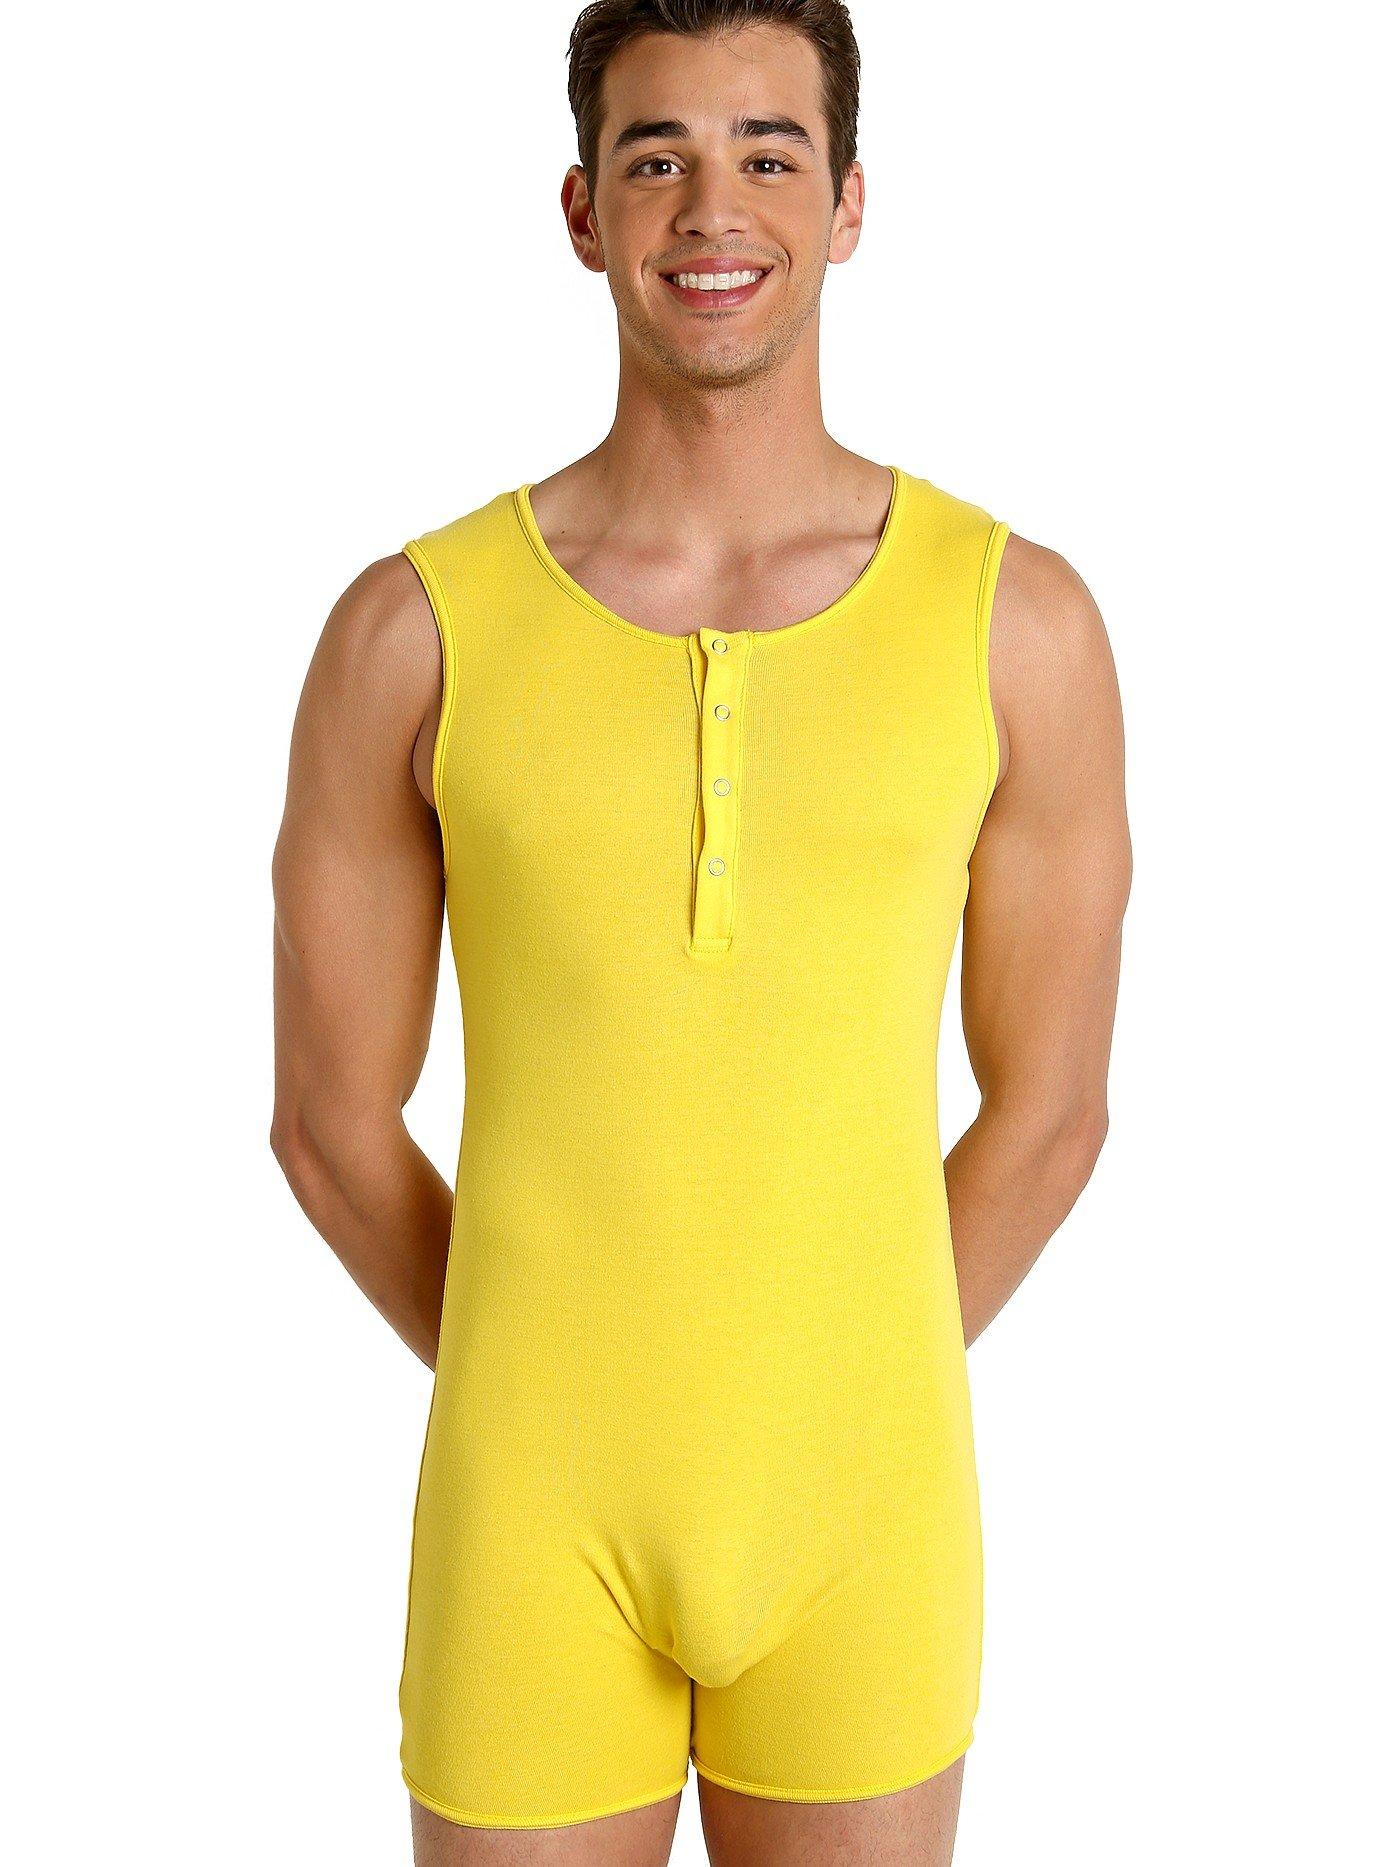 Go Softwear California Guy Onesie Sunshine Yellow